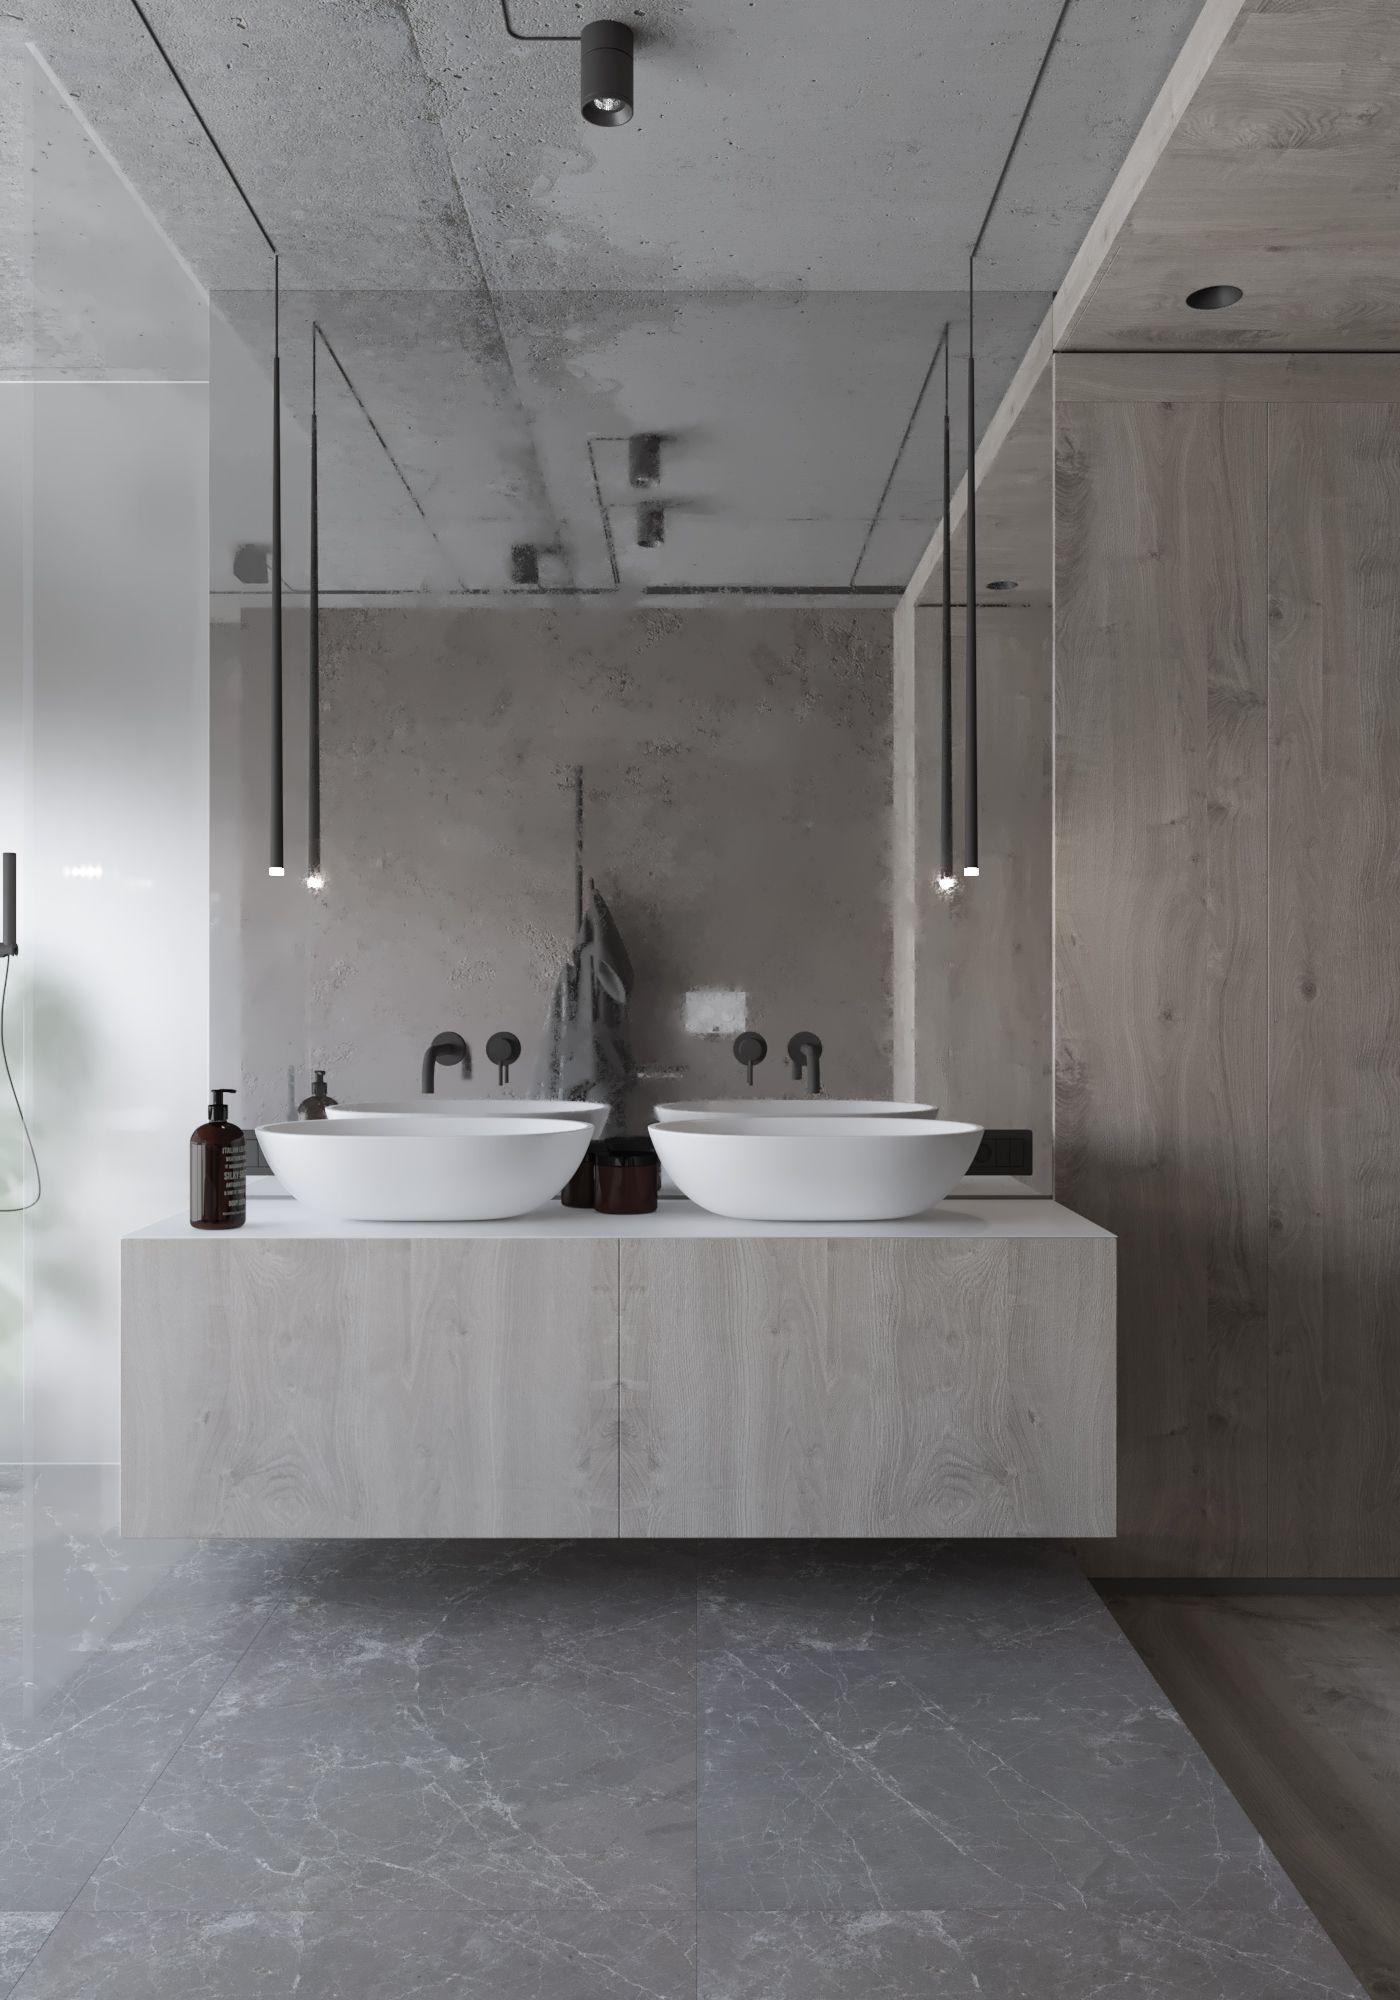 COCOON black bathroom taps bycocoon.com | black taps inspiration ...